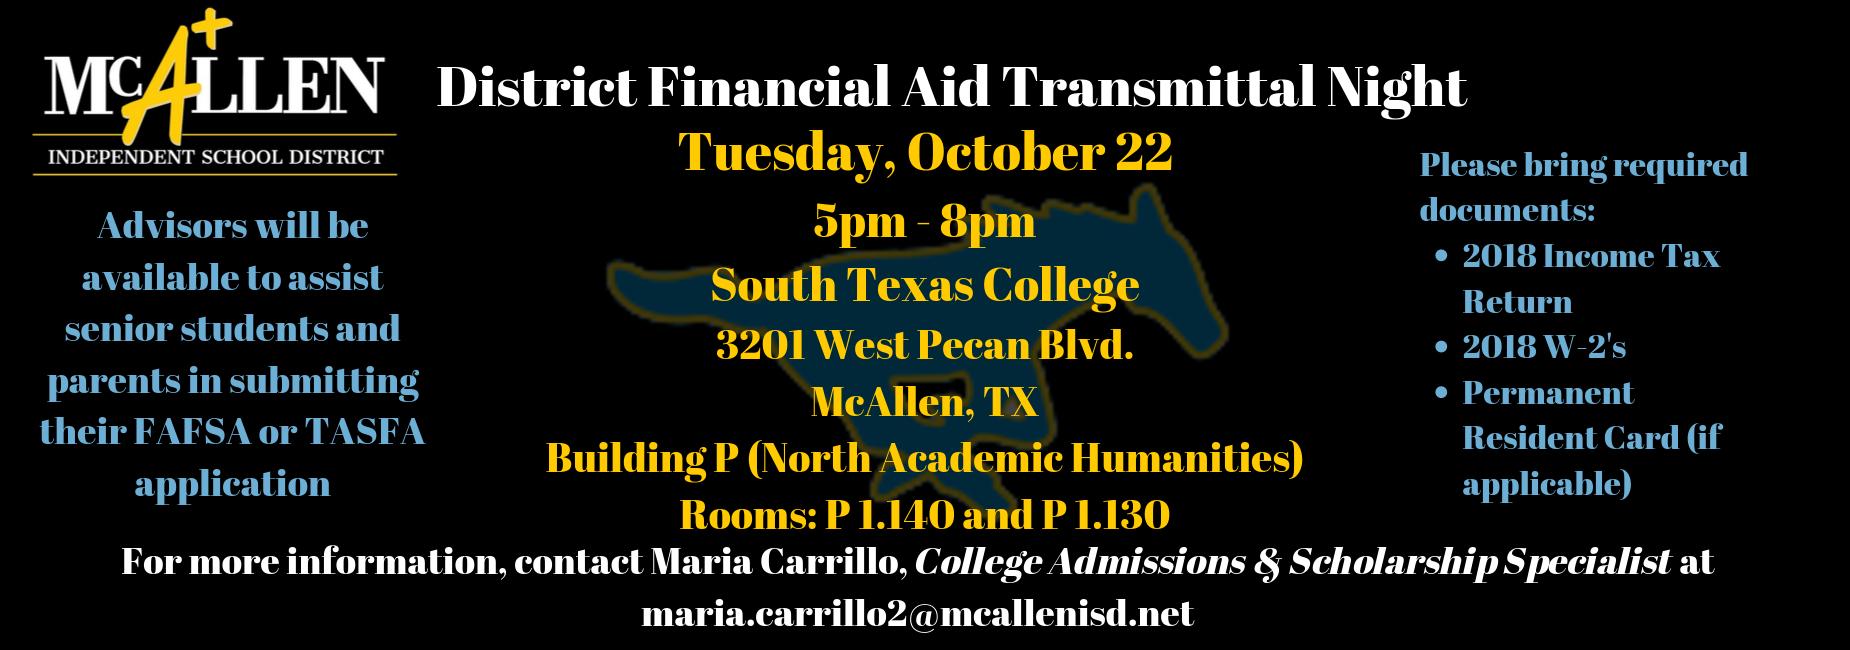 McAllen ISD financial aid transmittal information